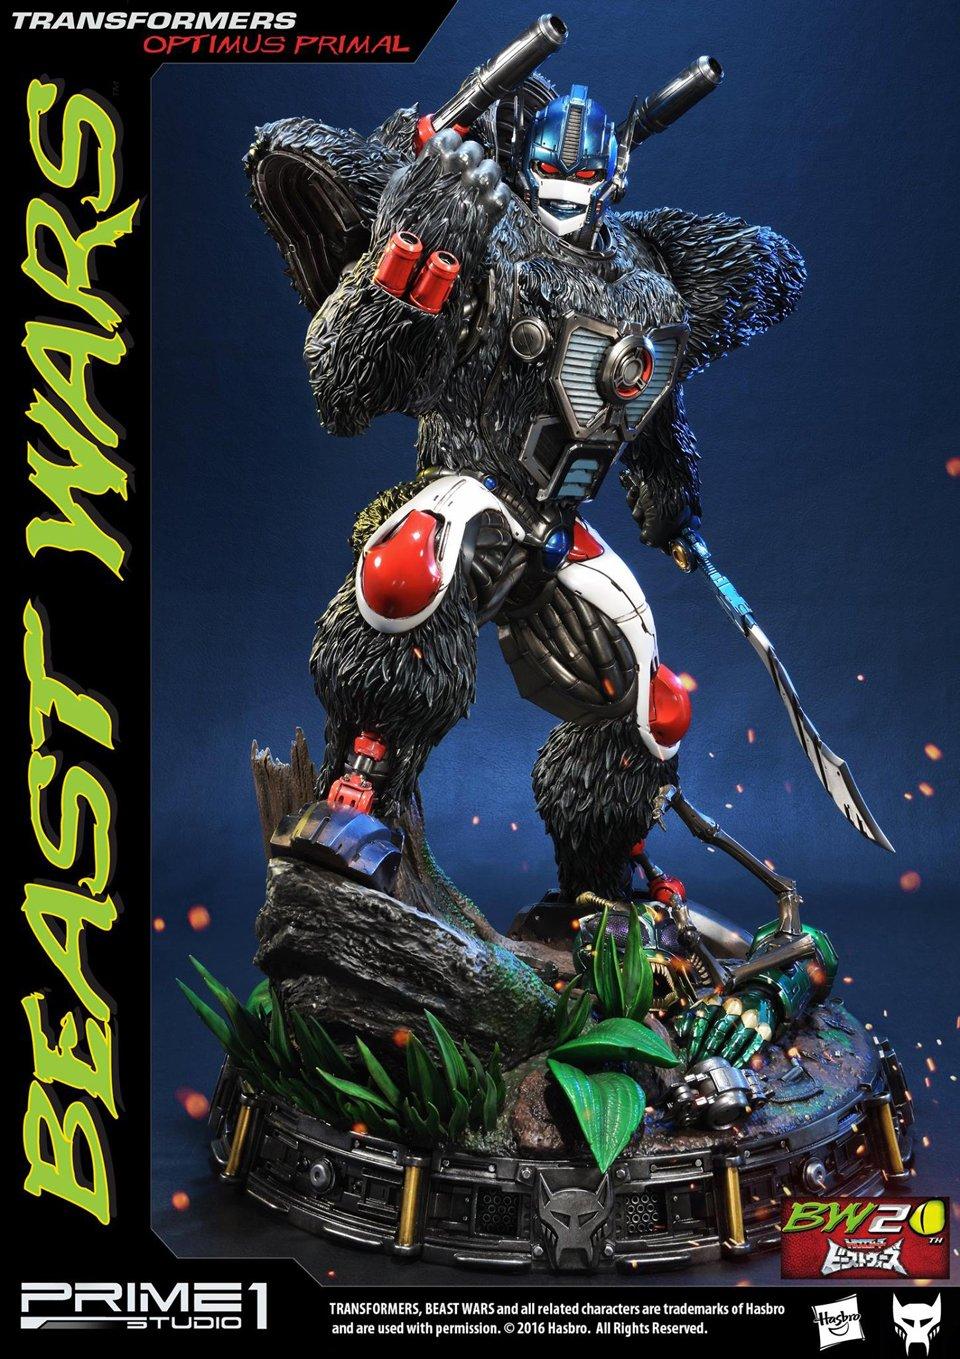 Prime 1 Beast Wars Optimus Primal Statue